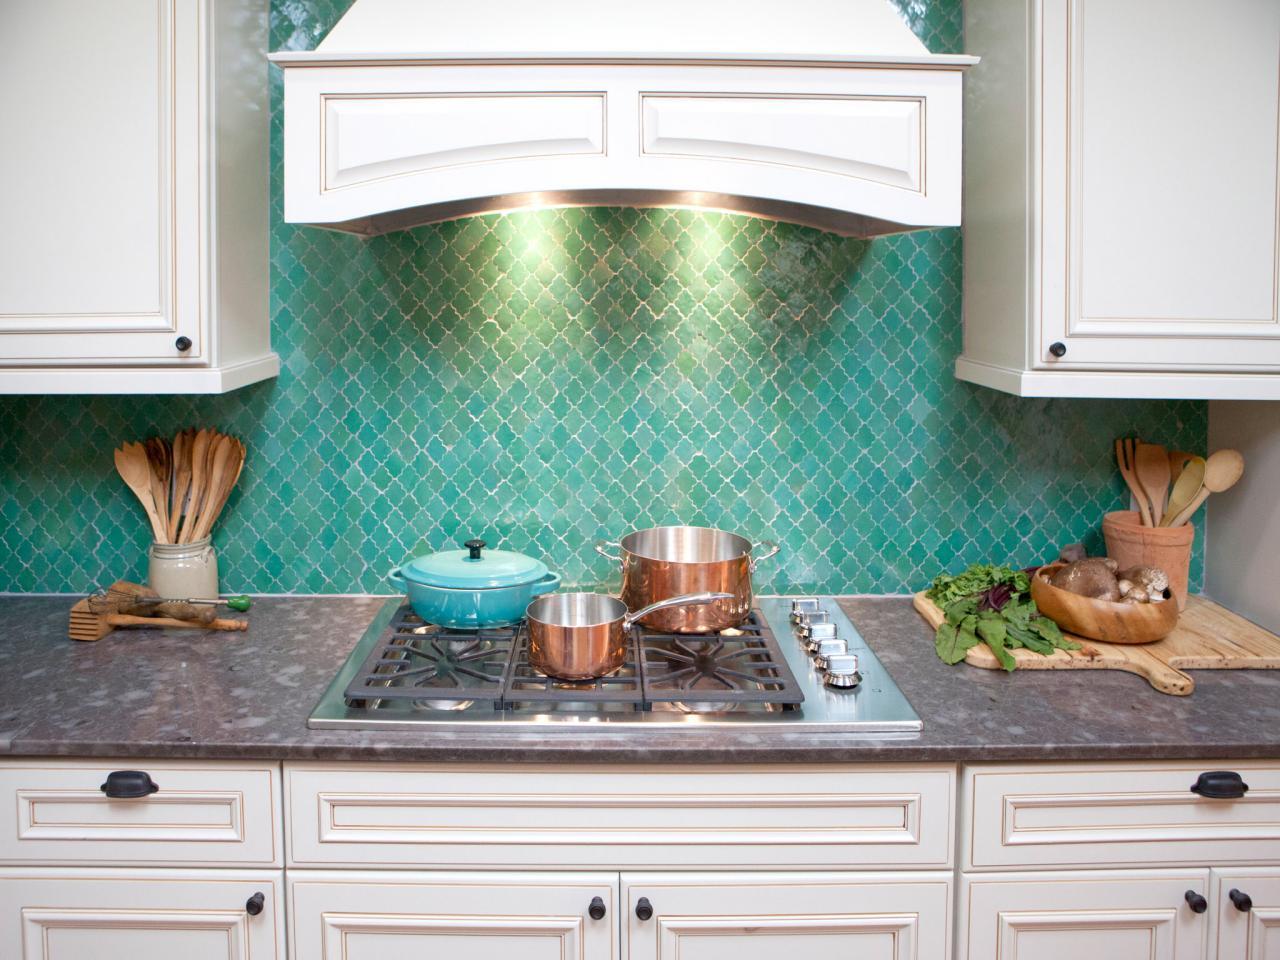 15 Stunning Kitchen Backsplashes | DIY Network Blog: Made + Remade | DIY